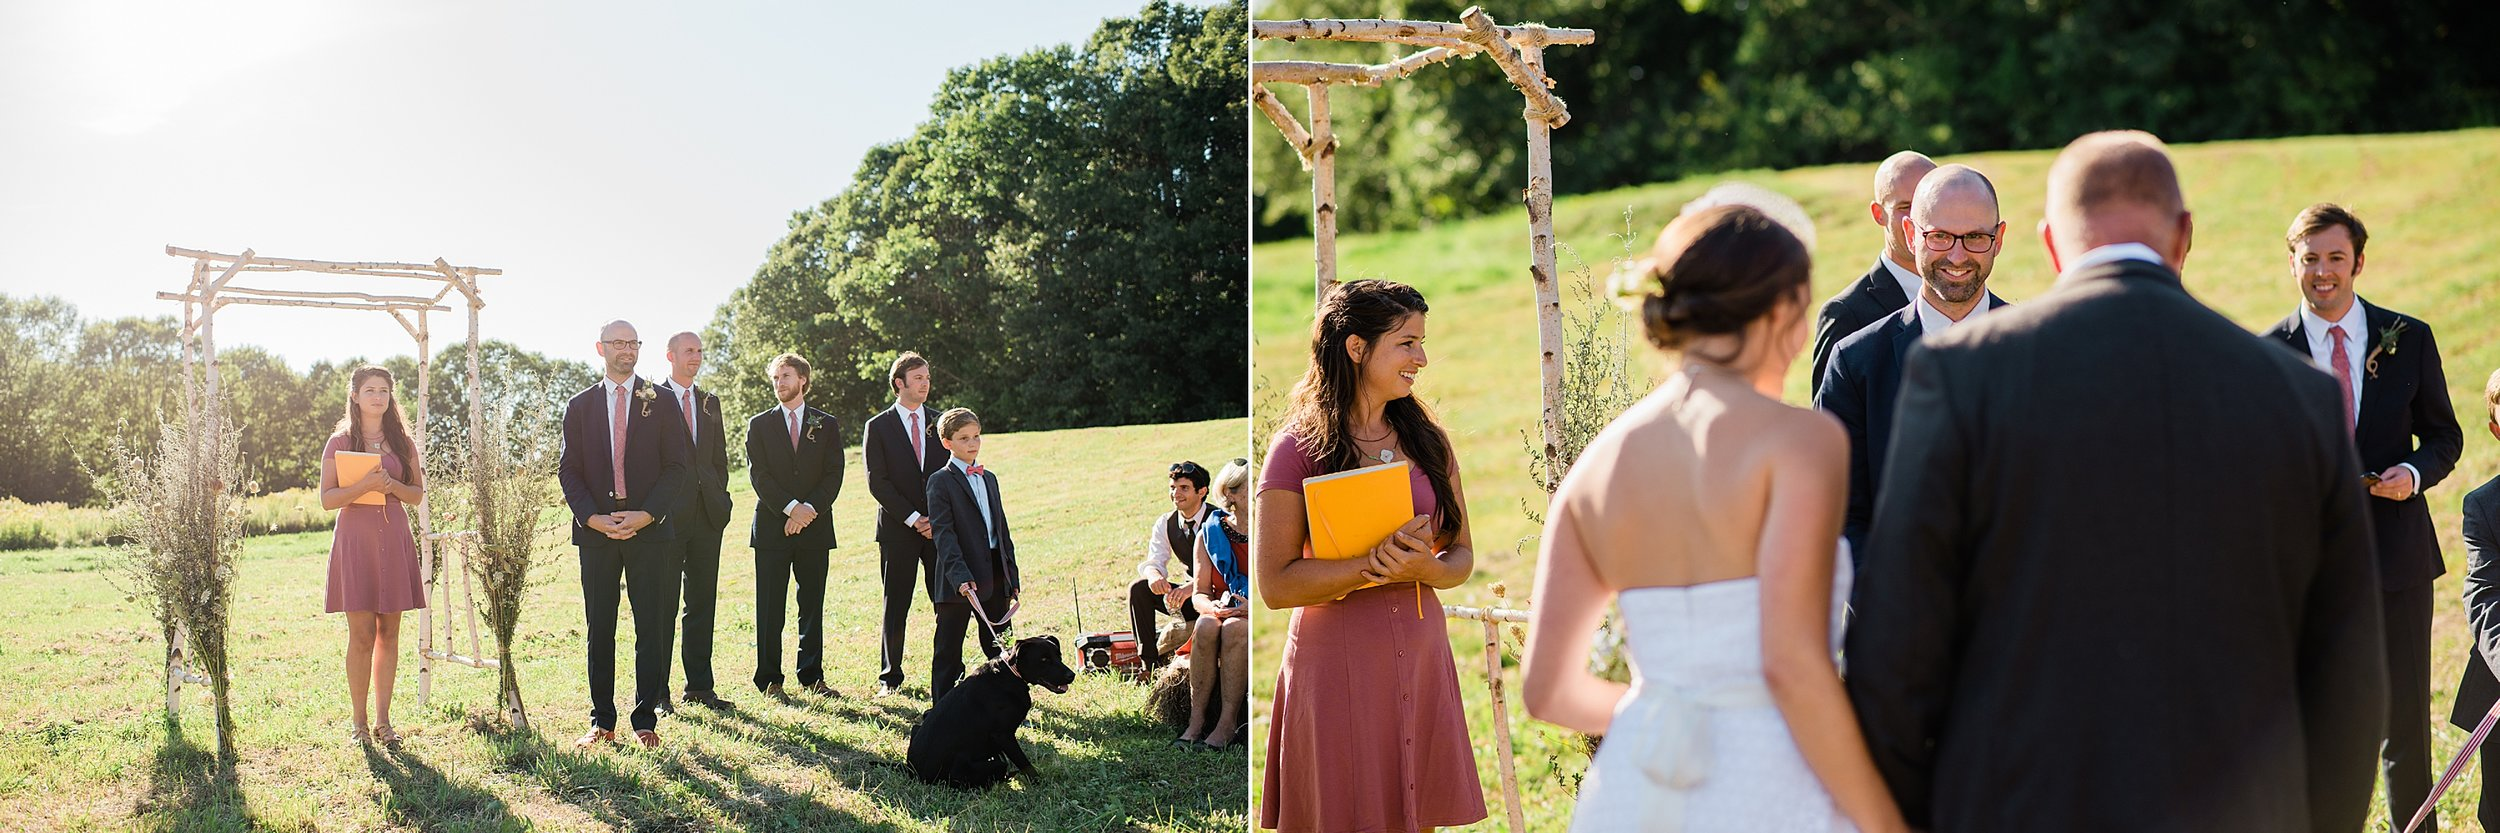 037 los angeles wedding photographer.jpg